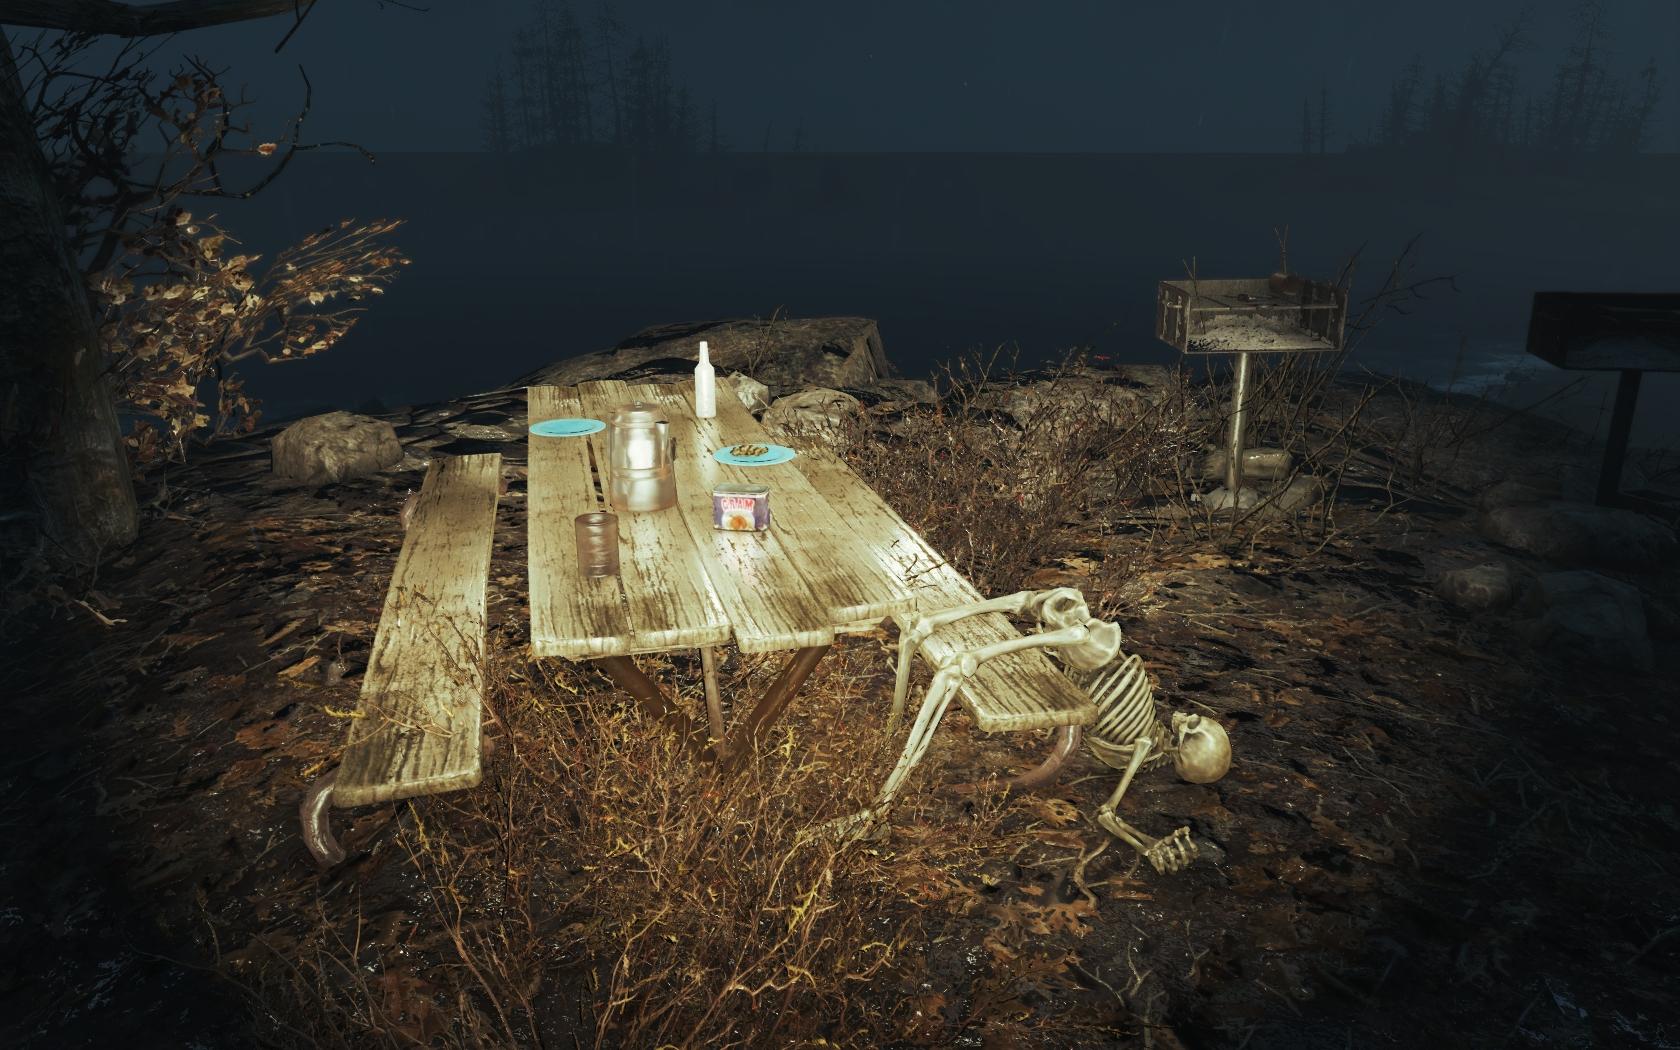 Обед до отвала (Фар-Харбор, восточнее Туристического центра национального парка) - Fallout 4 скелет, Туристический центр национального парка